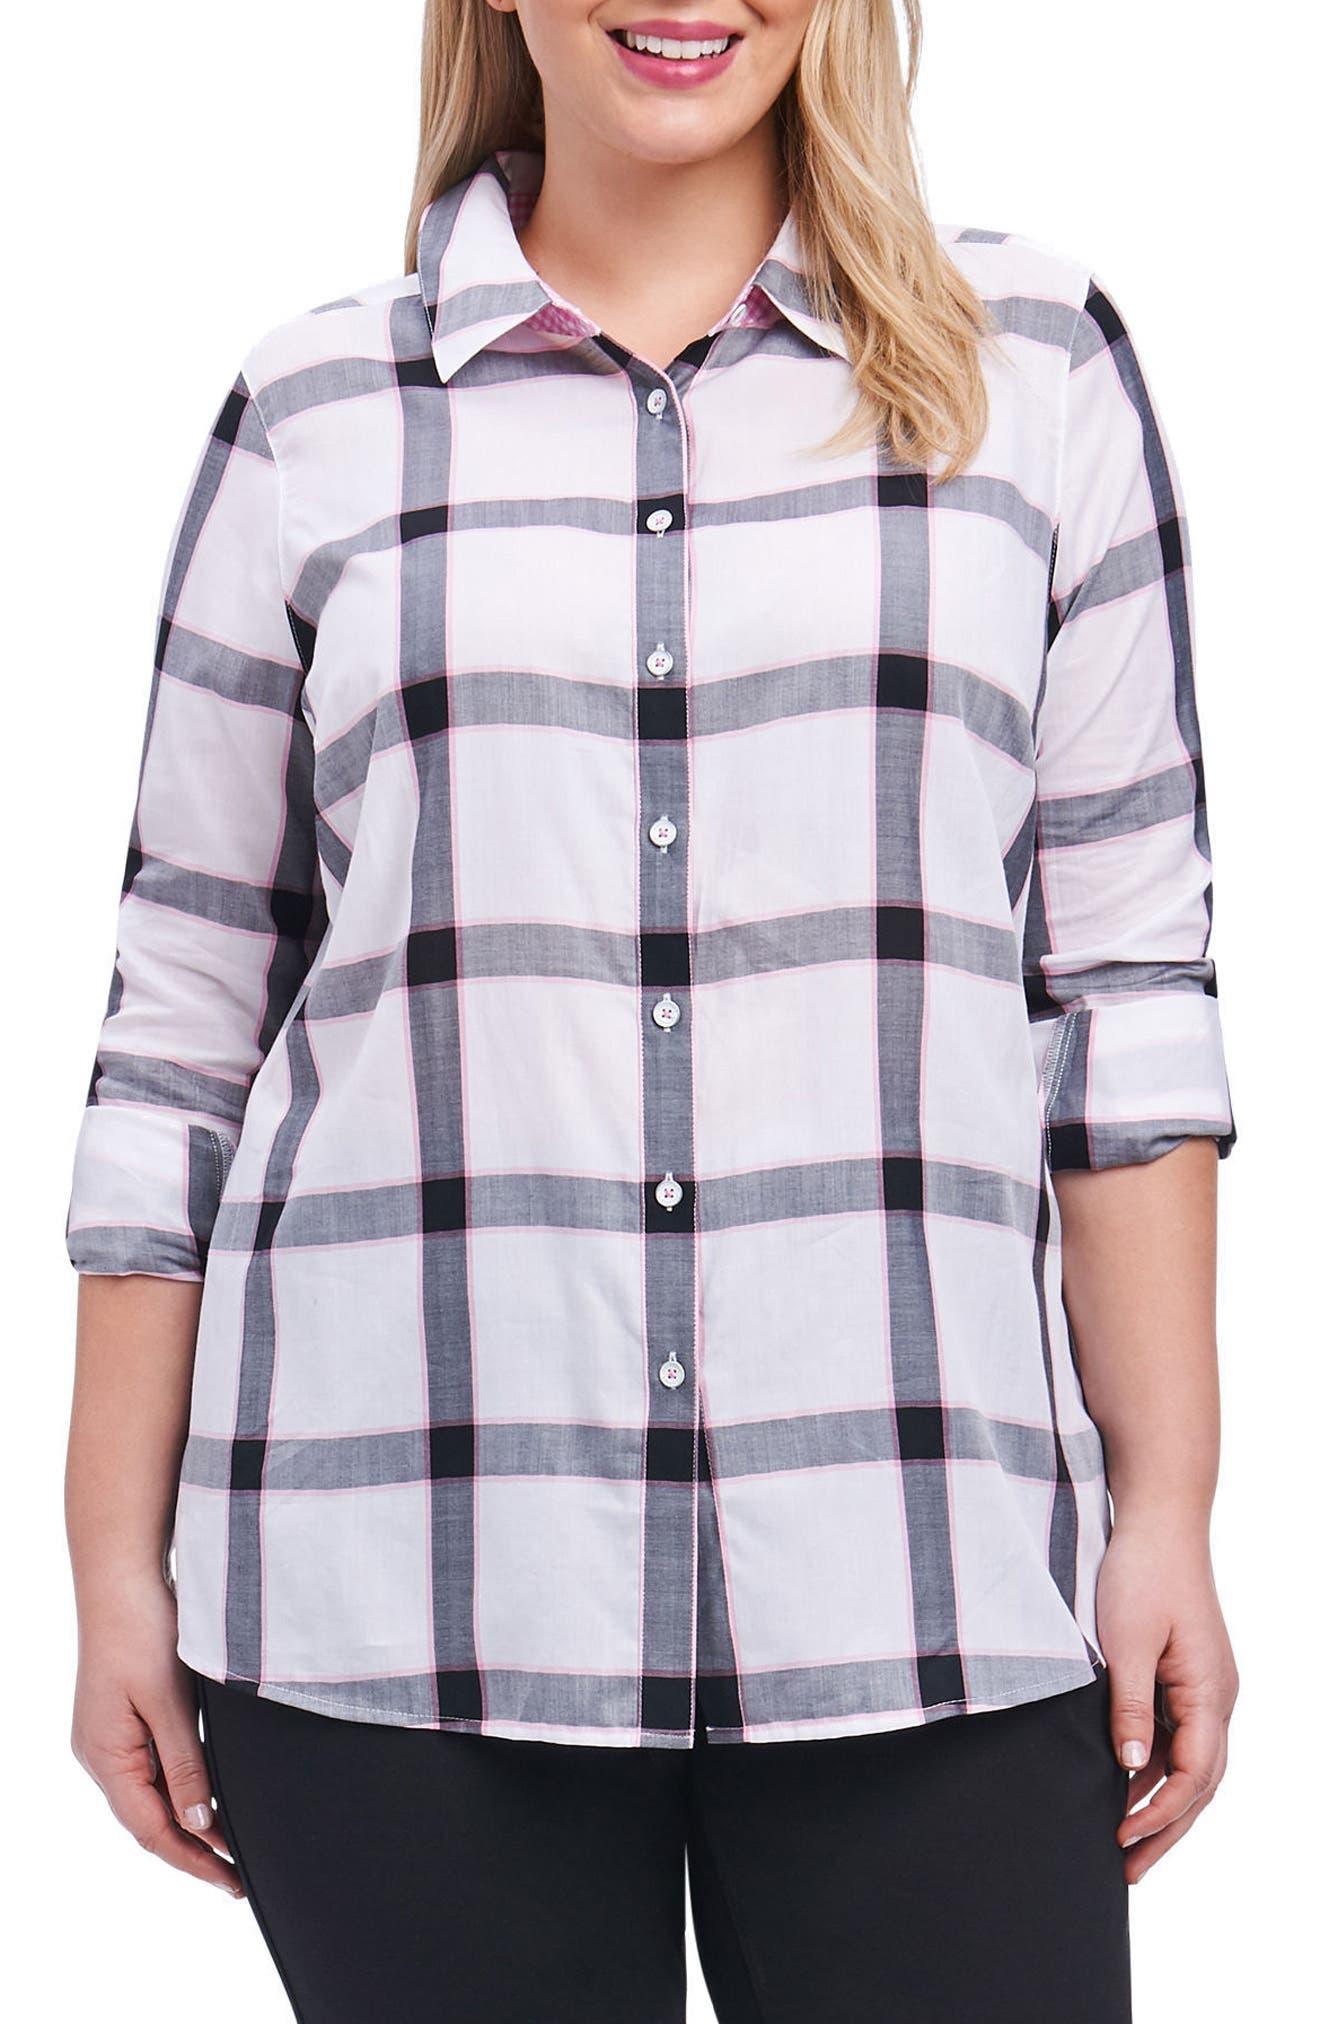 Main Image - Foxcroft Zoey Herringbone Plaid Shirt (Plus Size)